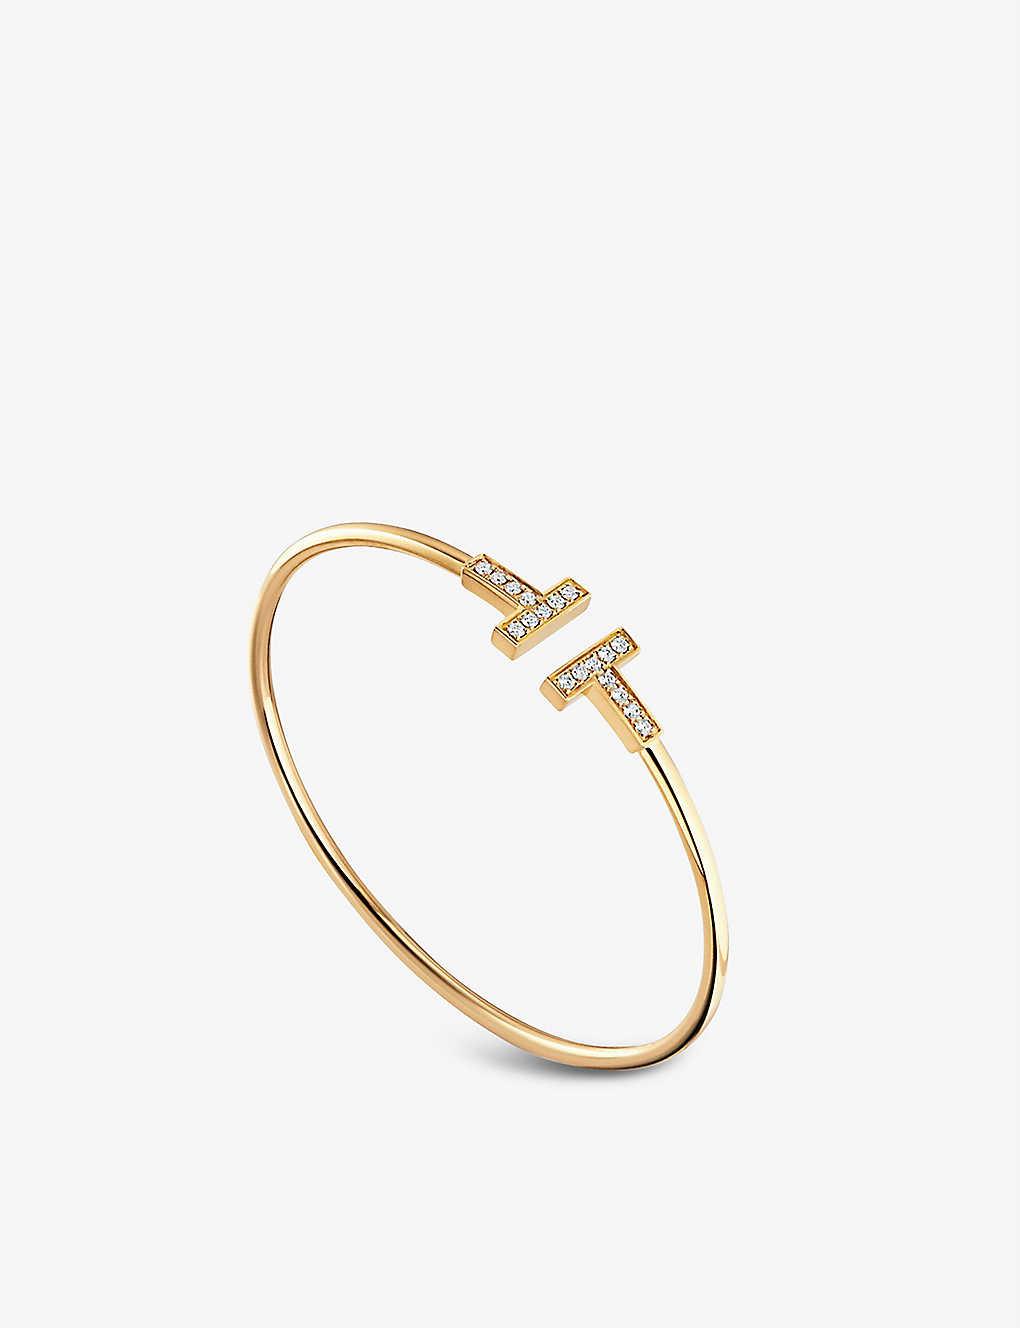 6b6d39d62 TIFFANY & CO - Tiffany T wire bracelet in 18k gold with diamonds ...